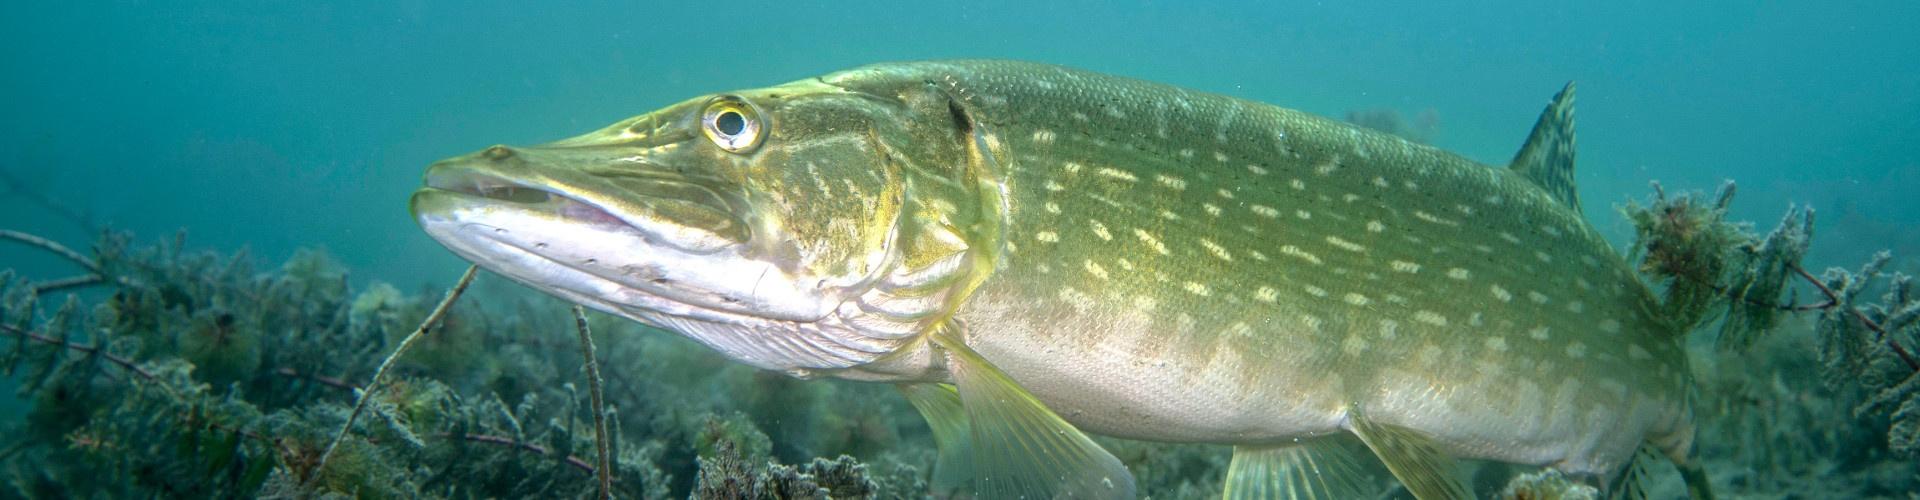 Fisch, © Franz Hajek